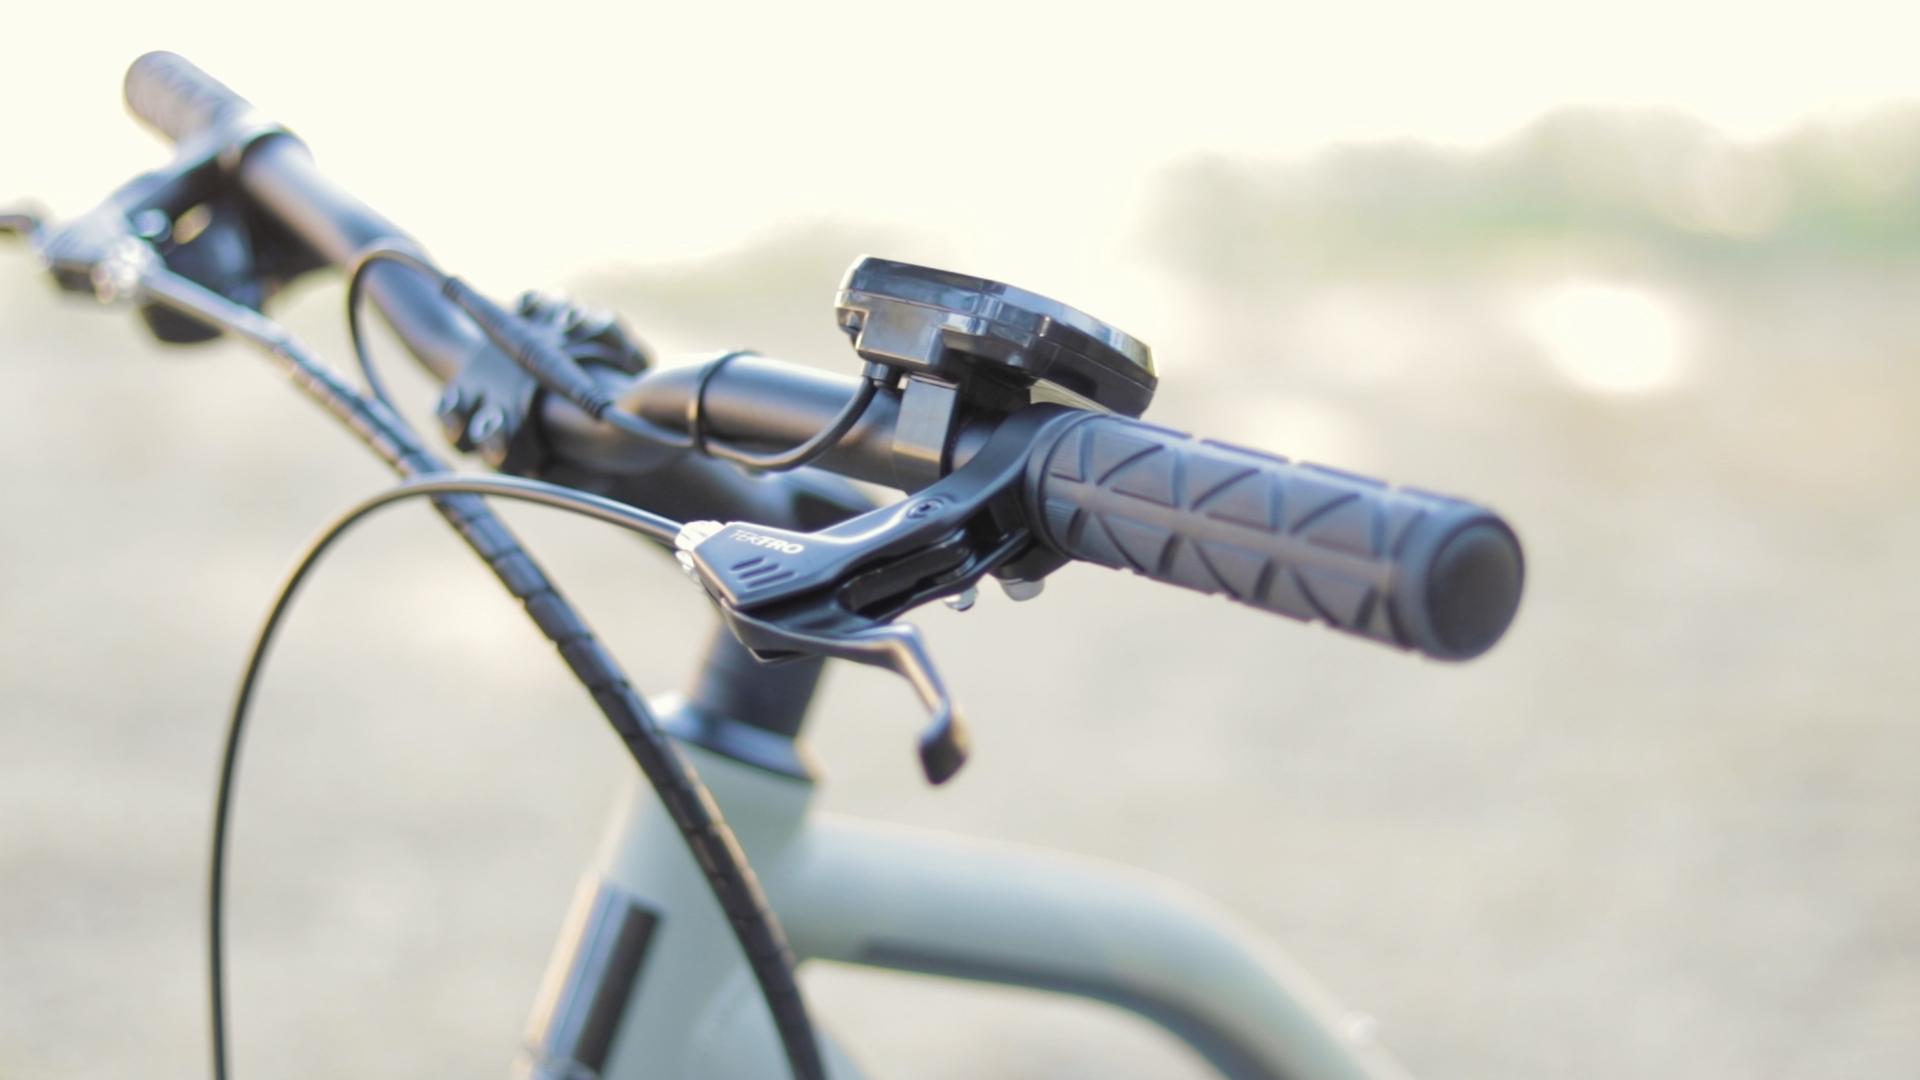 electrified-reviews-izip-trlz-electric-bike-review-handlebars.jpg